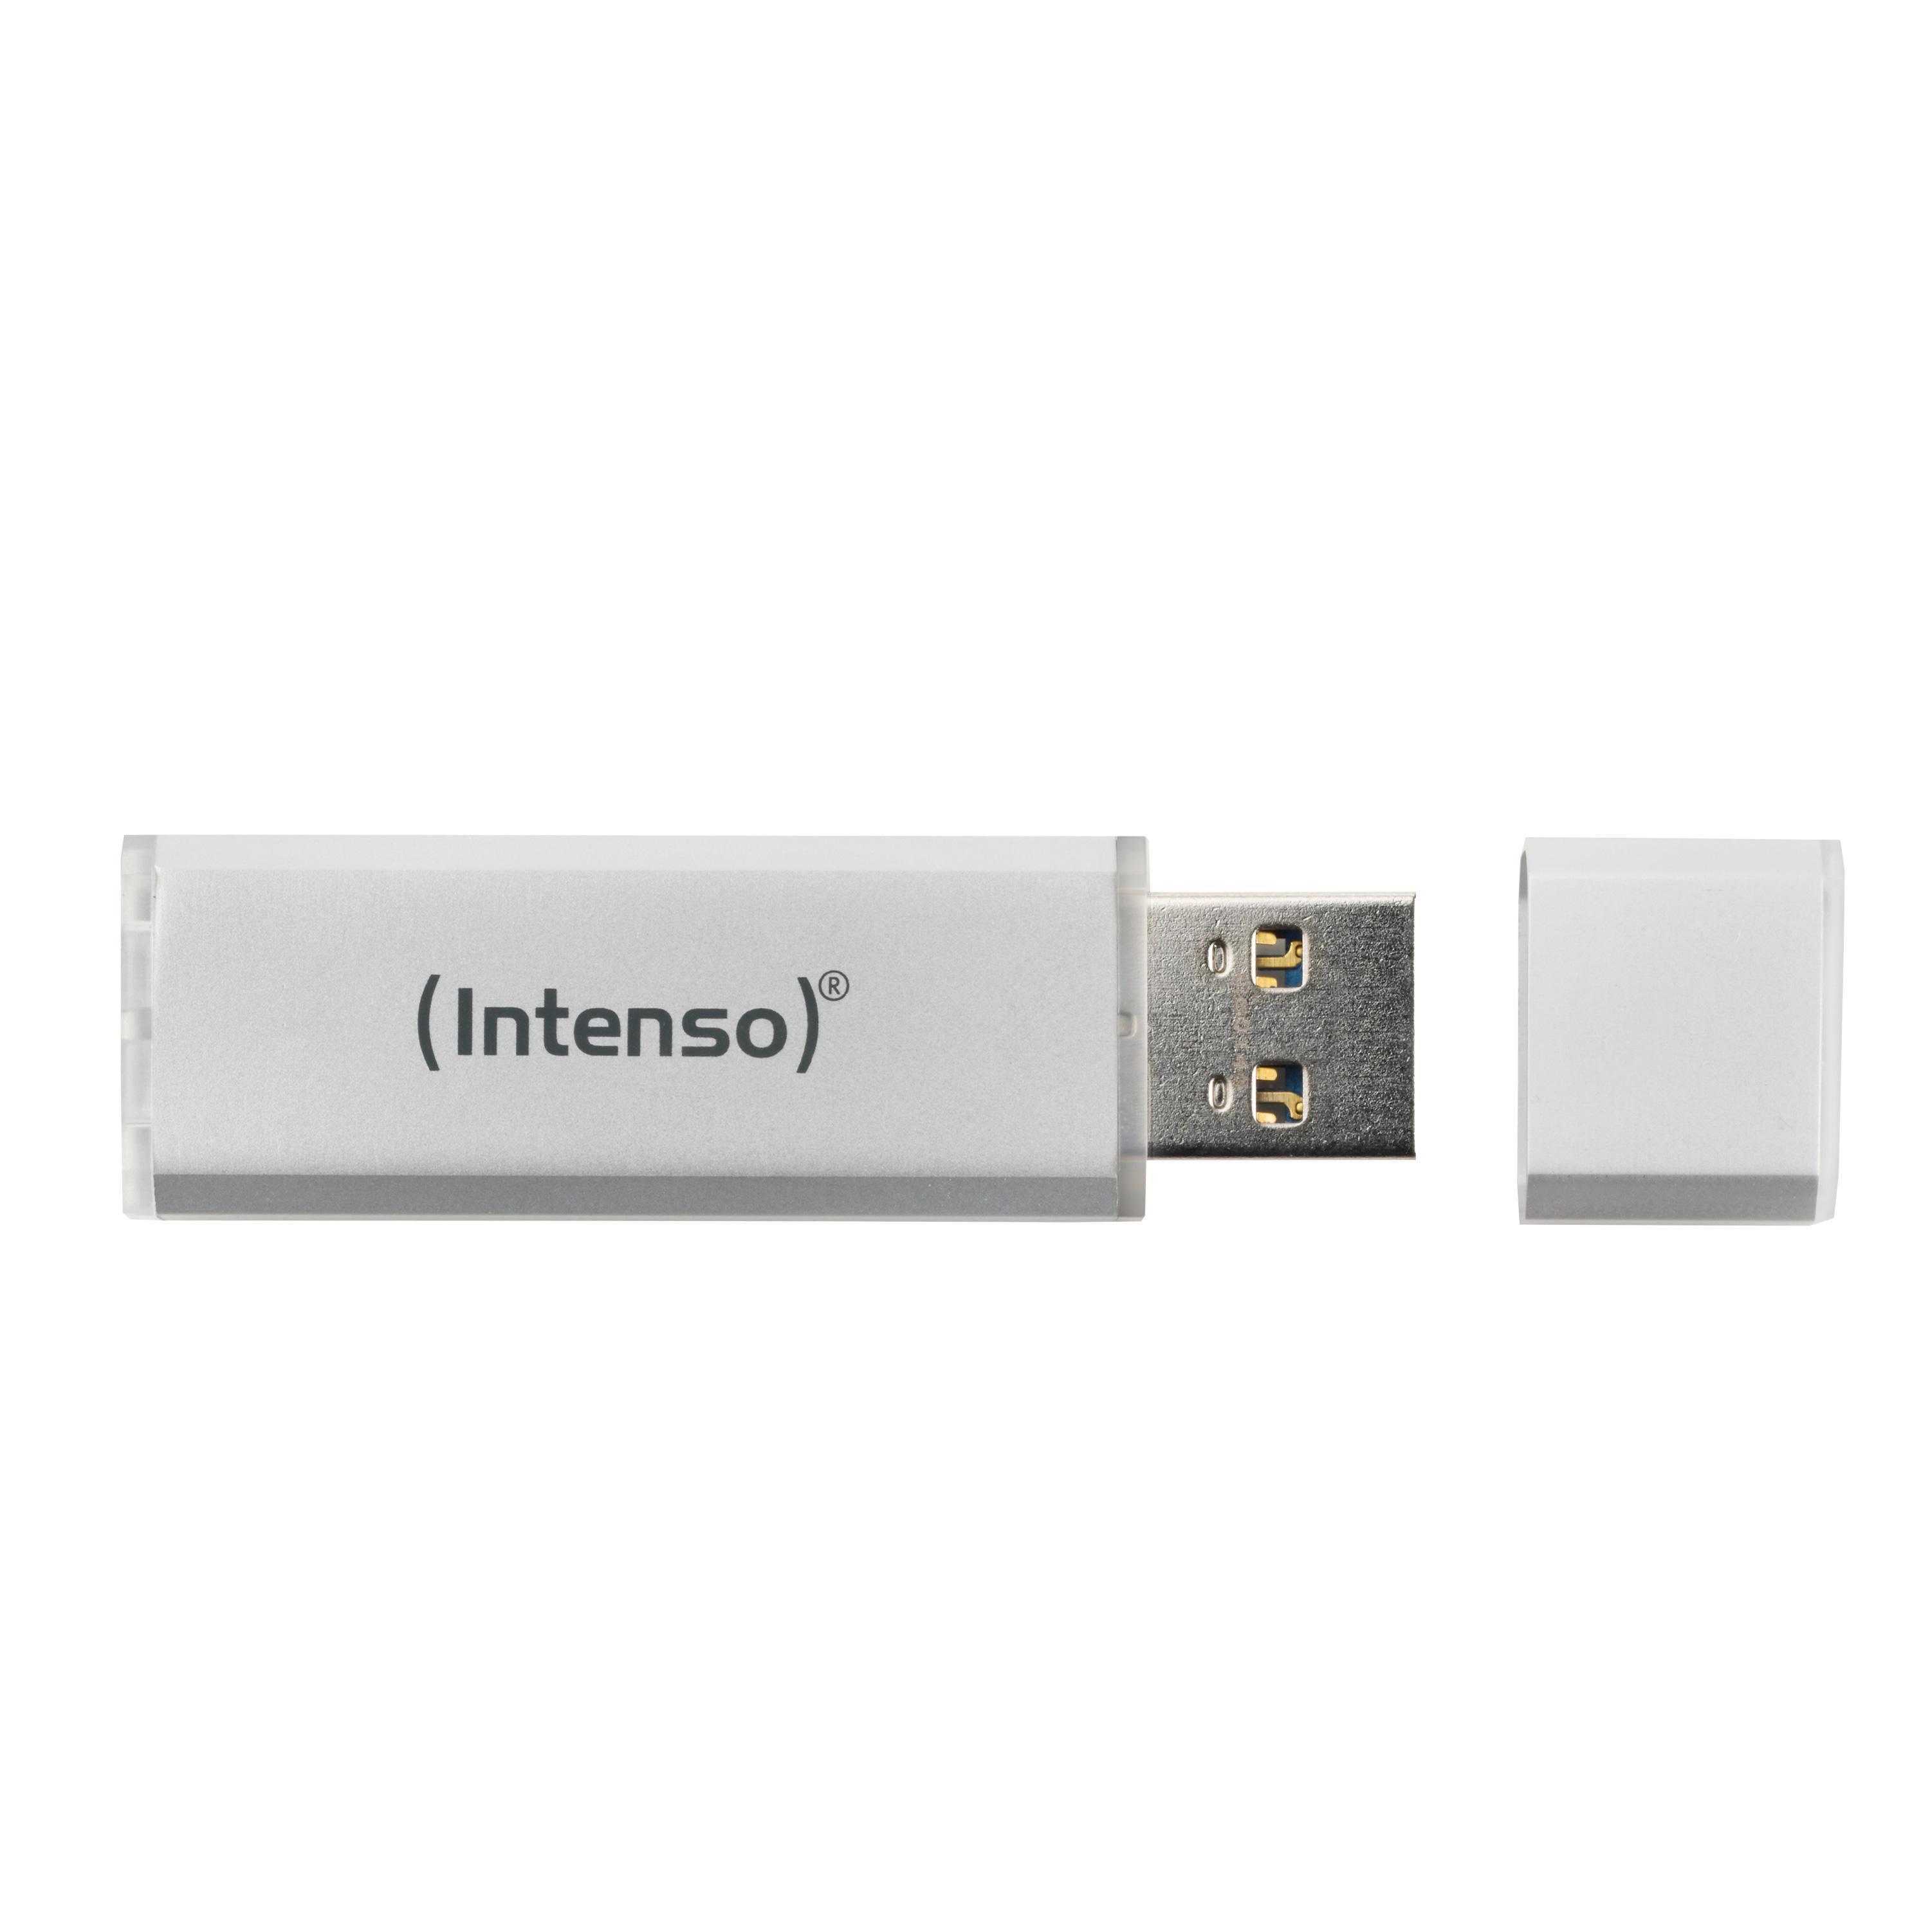 INTENSO USB32Gbbasicl 3503480